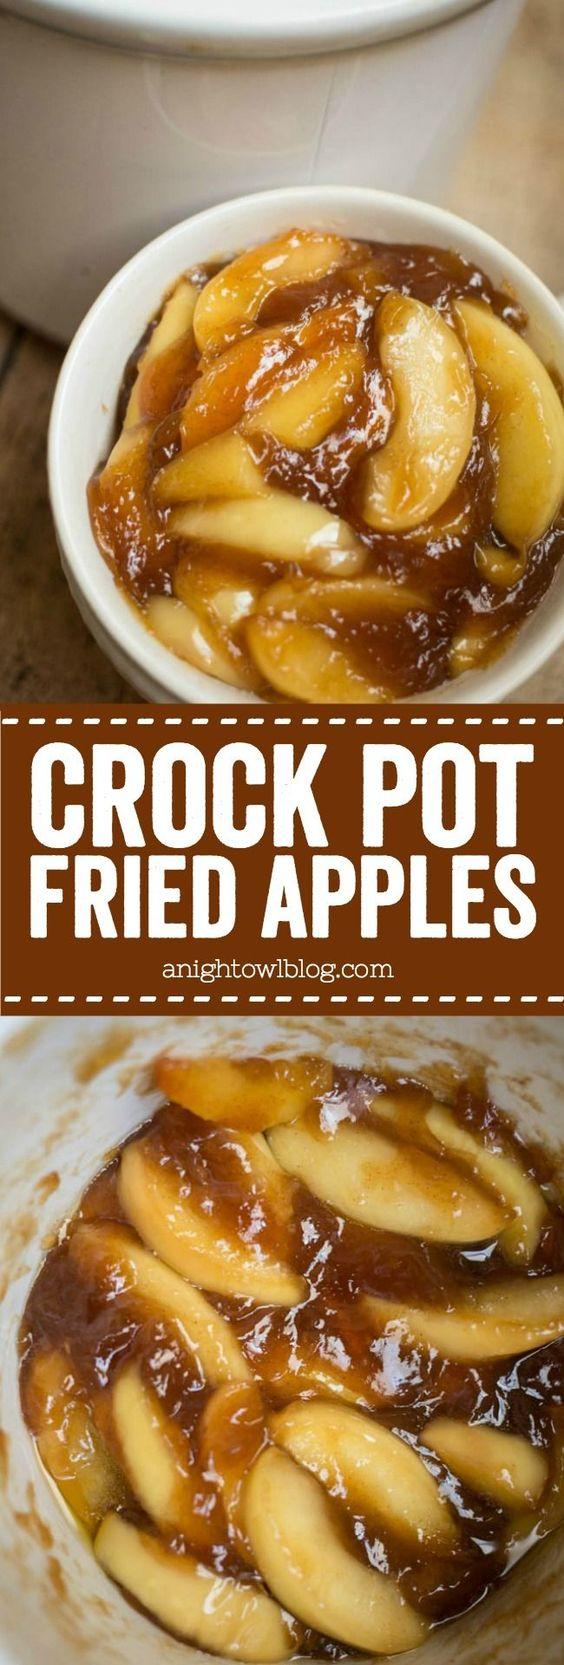 Easy Crock Pot Fried Apples.